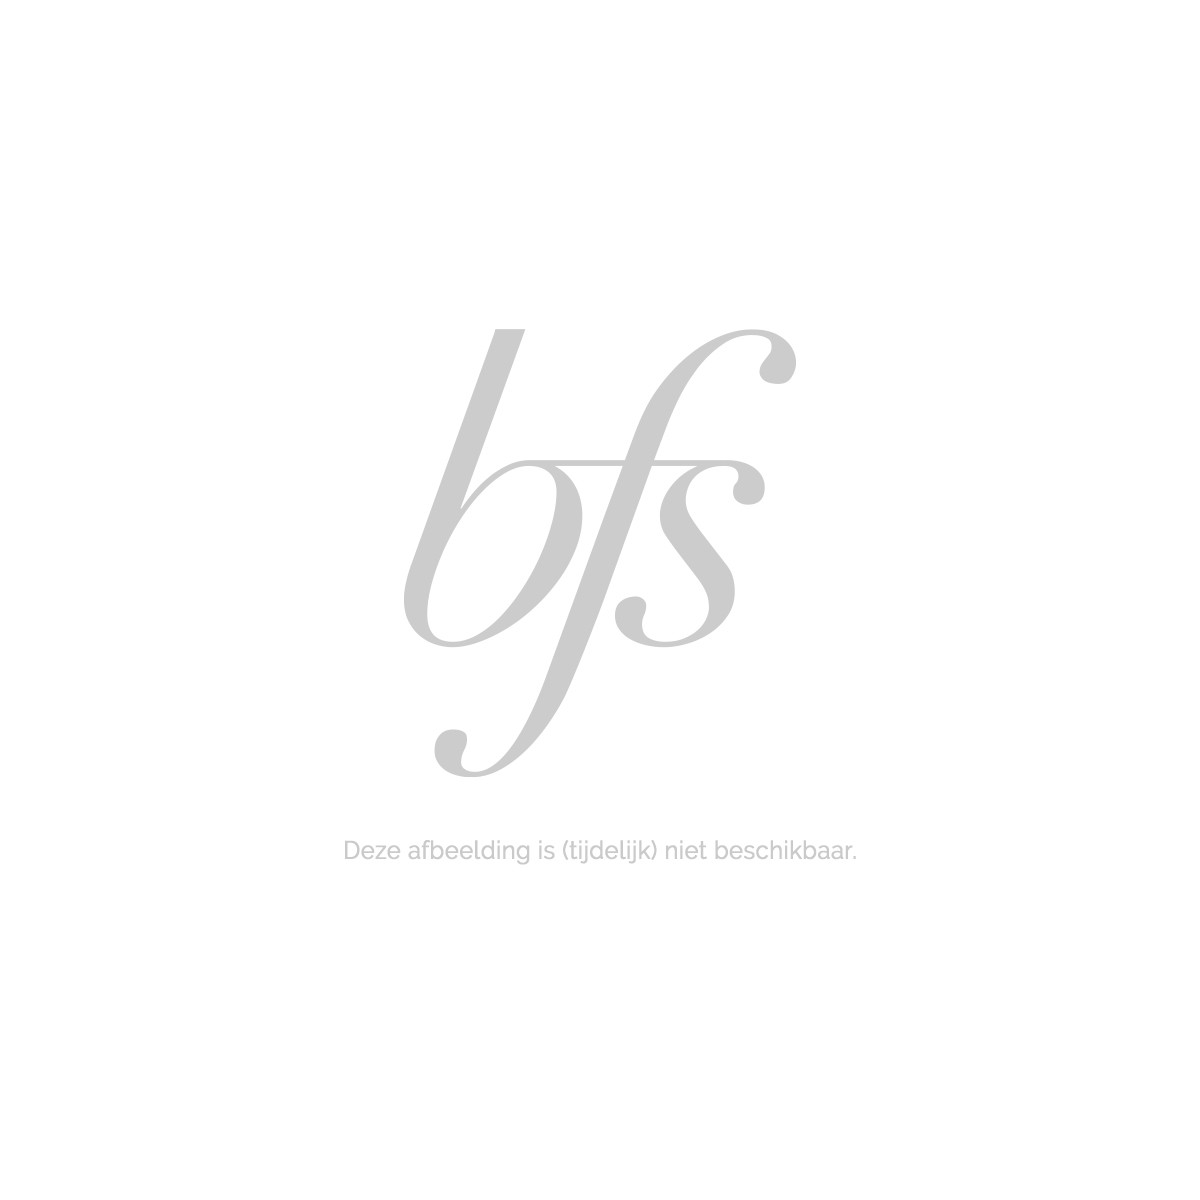 Shiseido Radiant Lifting Foundation Spf15 B00 Very Light Beige 30 Ml